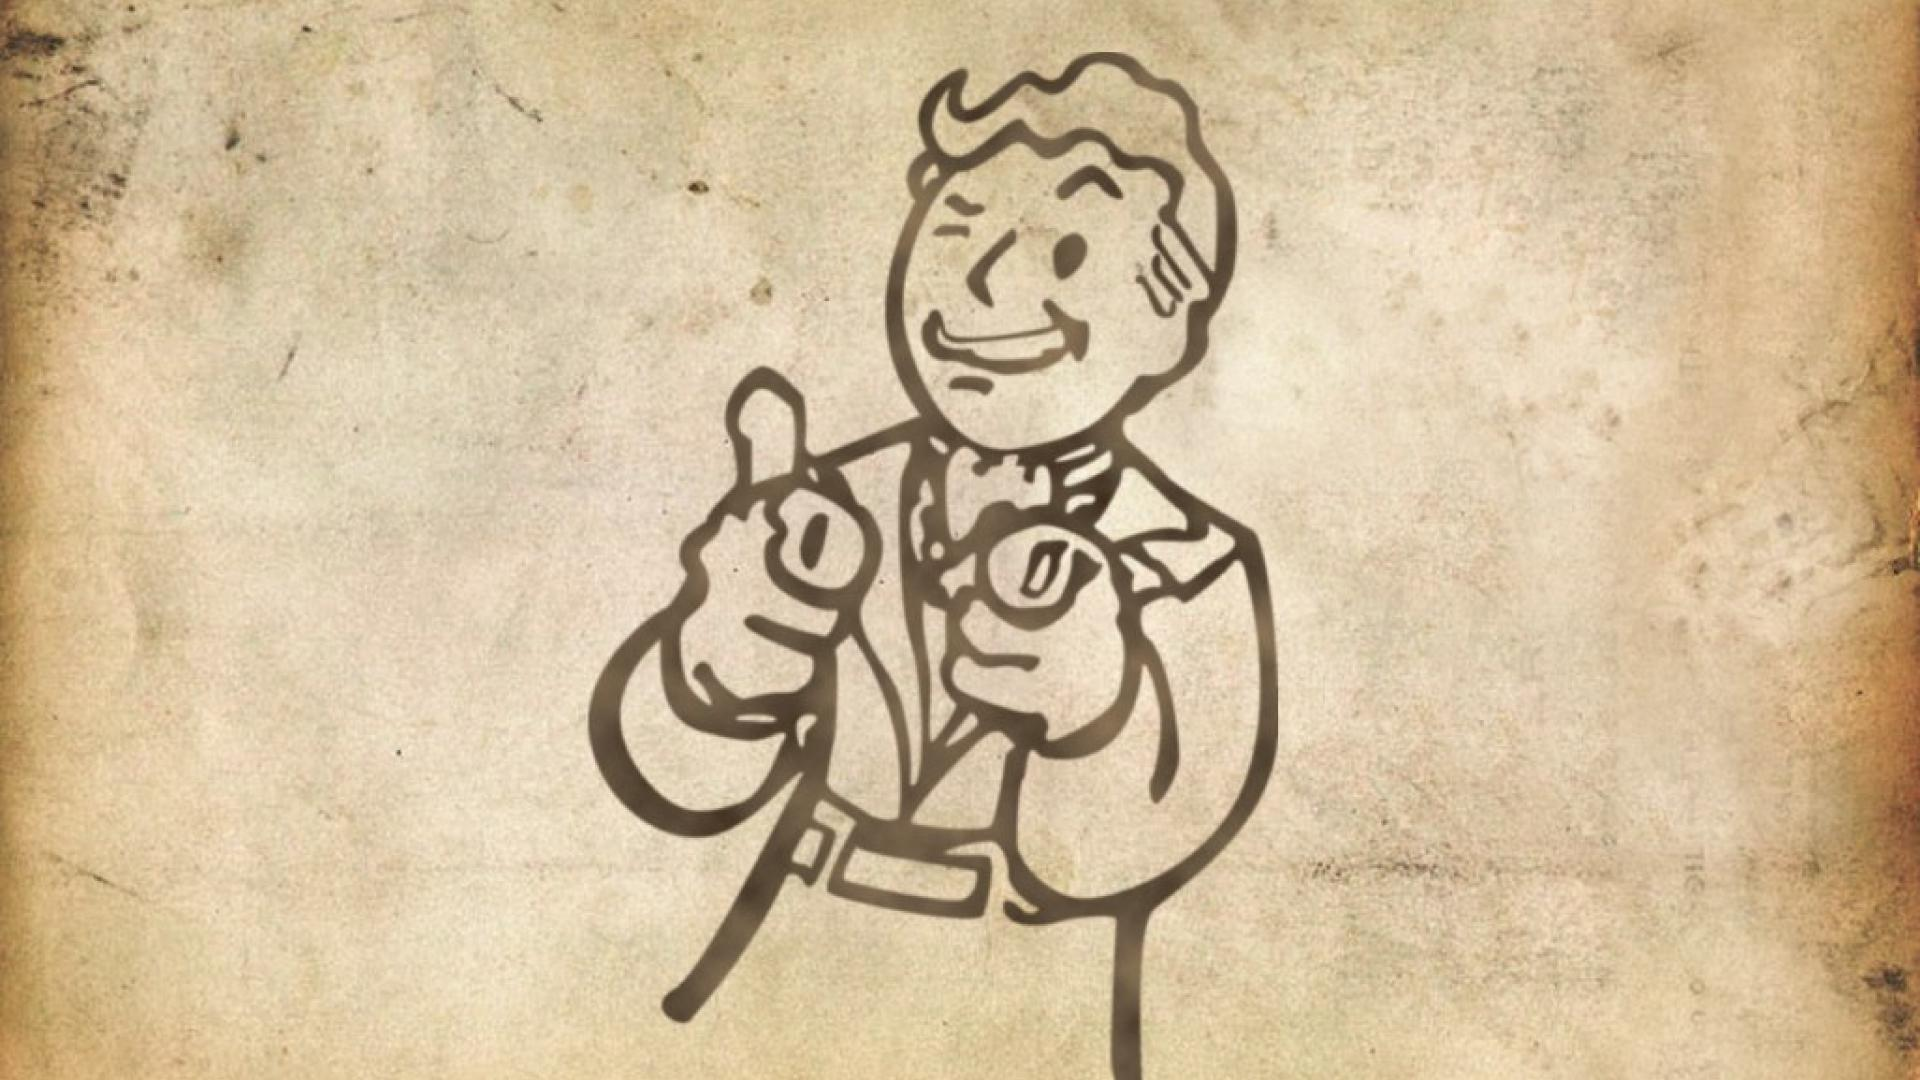 Free Download Fallout Vault Boy Hd Wallpaper 28115 Hq Desktop